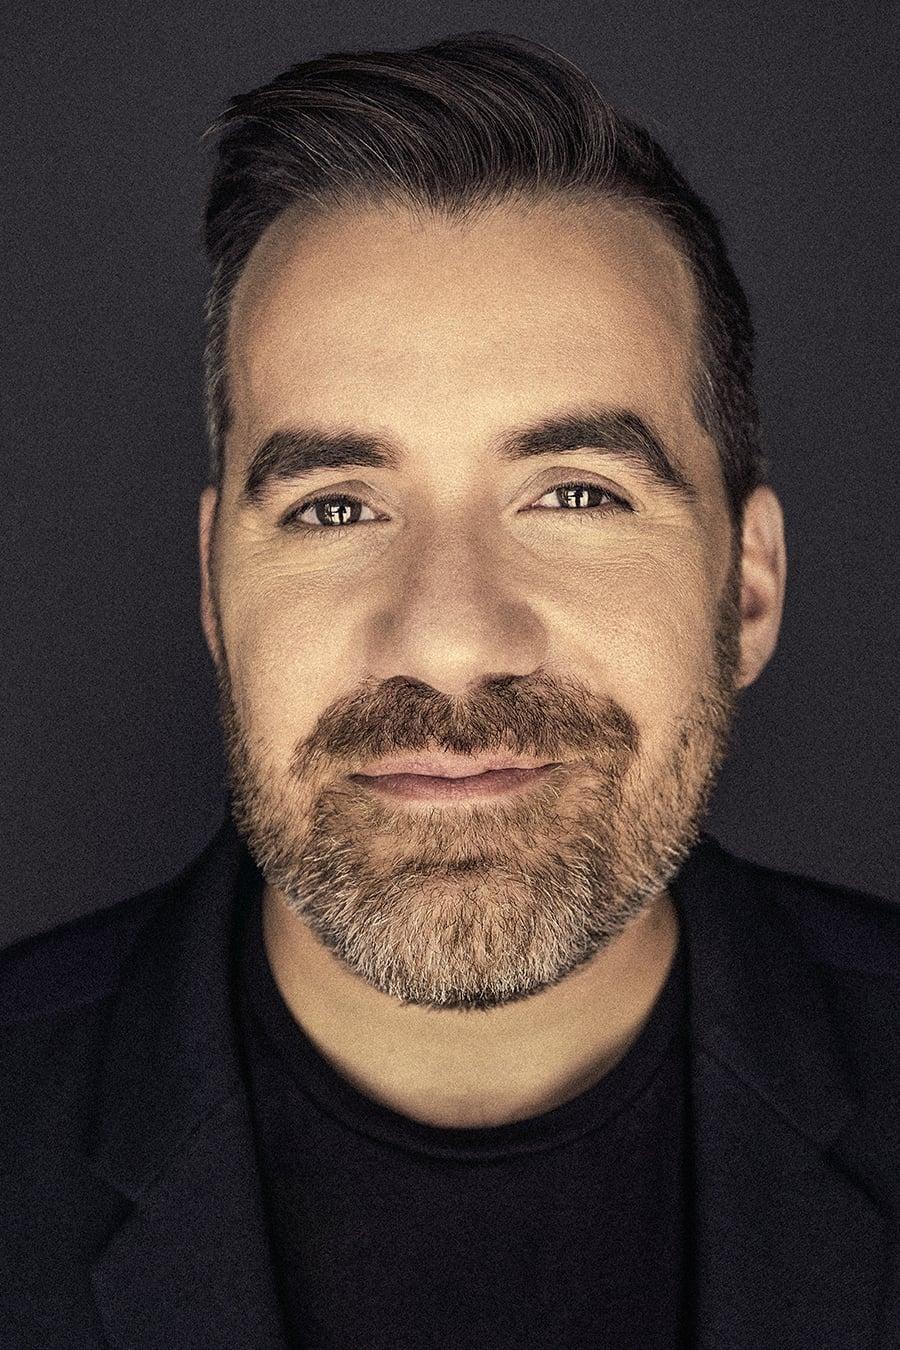 Jean-Sébastien Girard